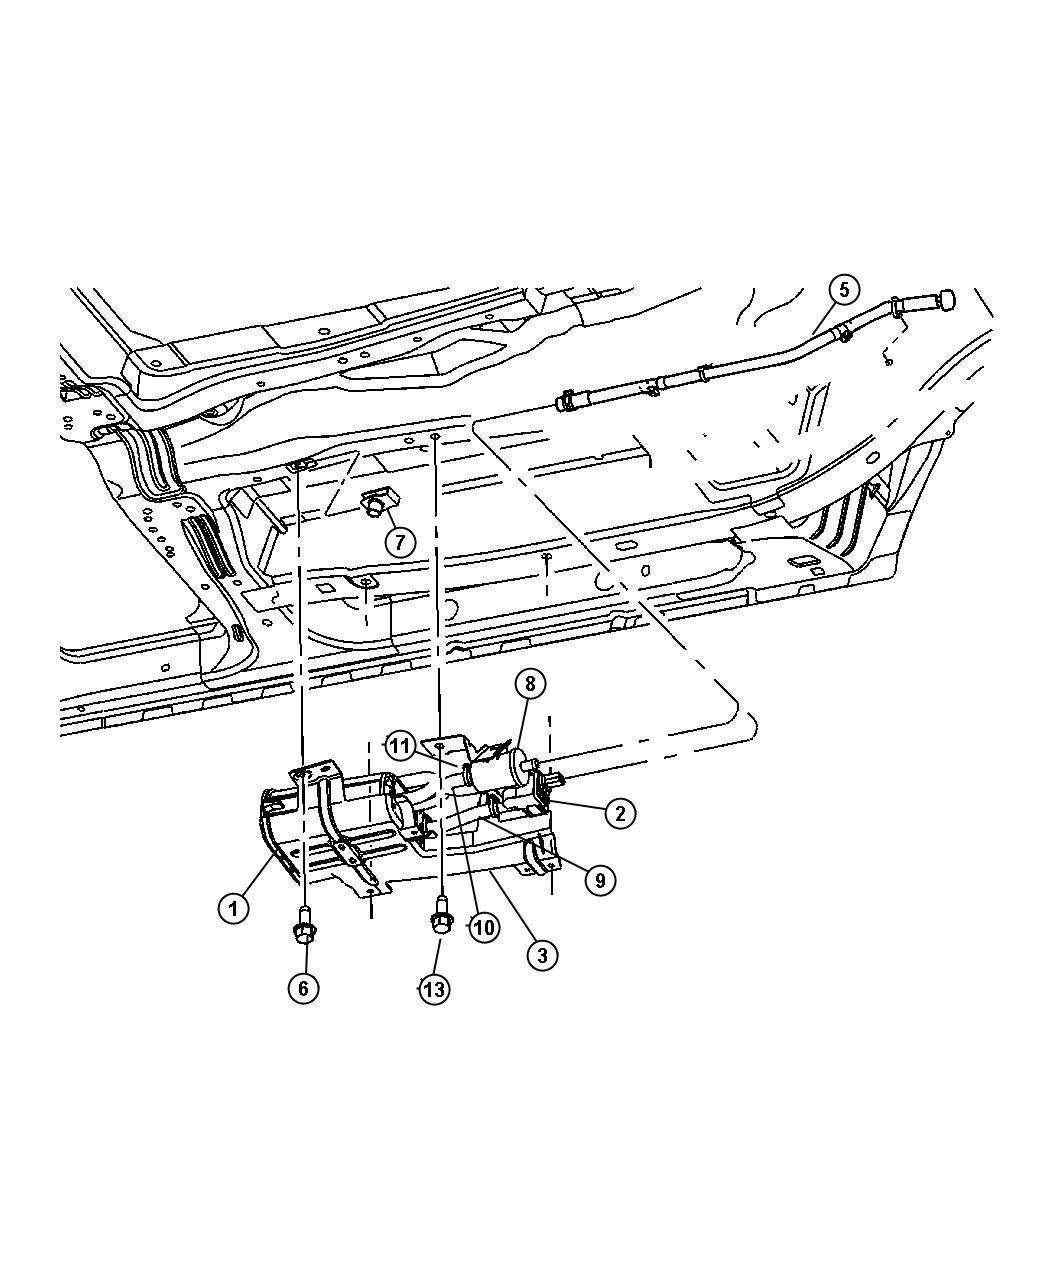 2007 buick lucerne parts catalog